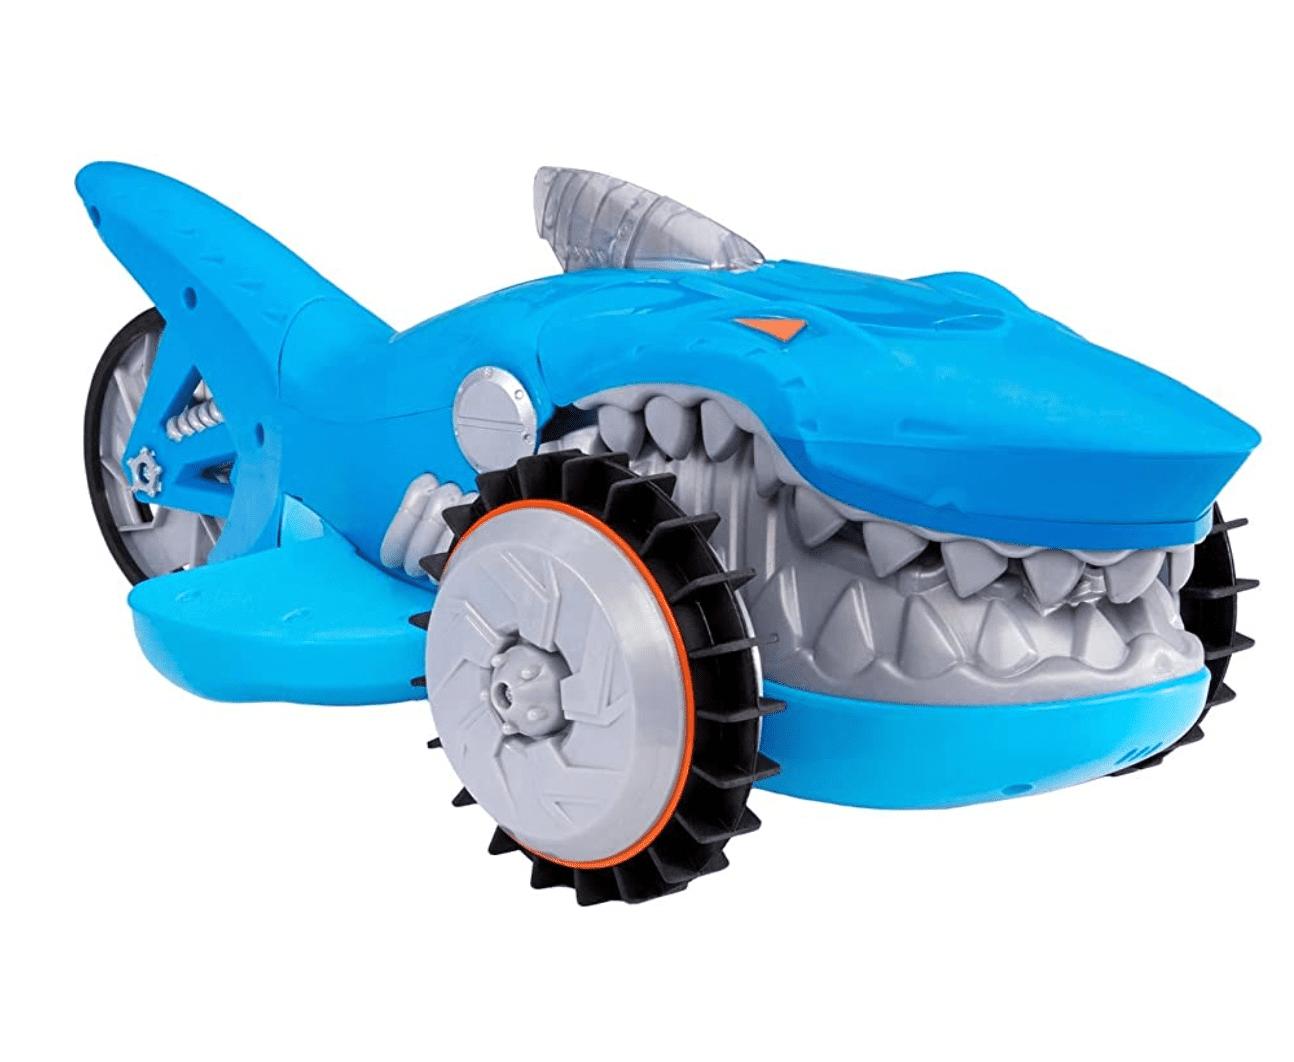 Hot Wheels R/C Supercharged Shark Vehicle